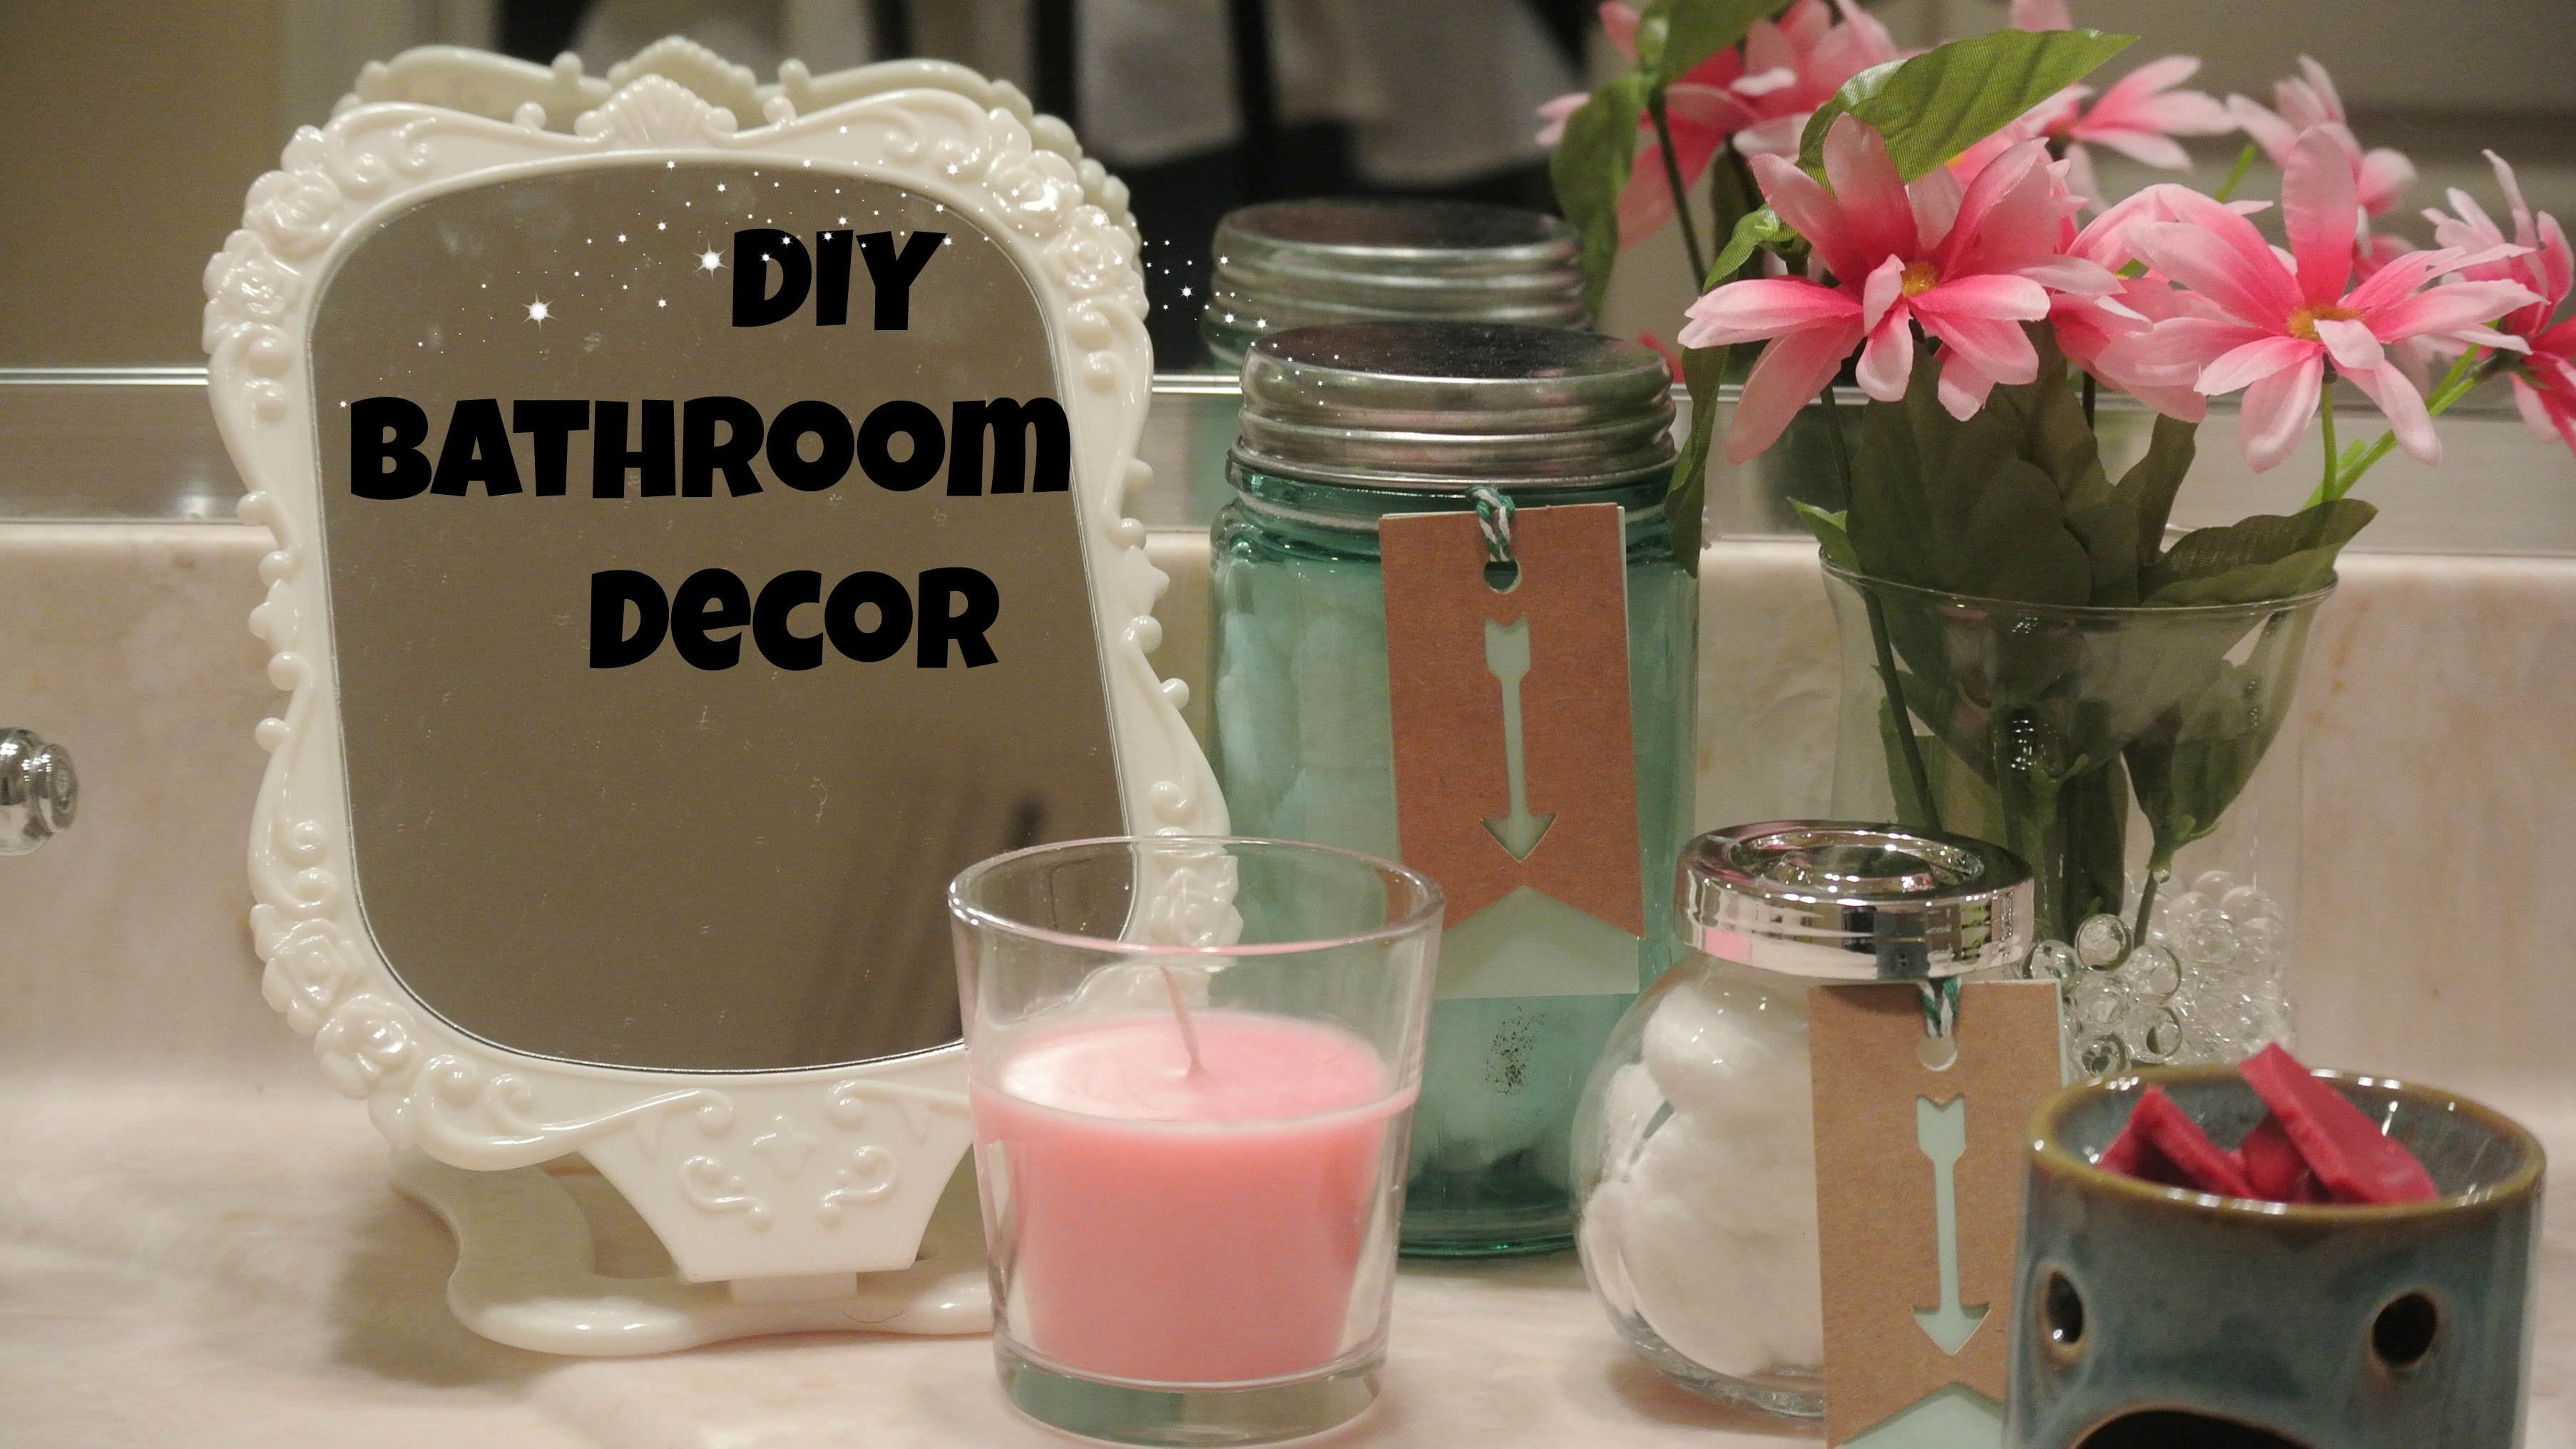 Diy Bathroom Decor Easy